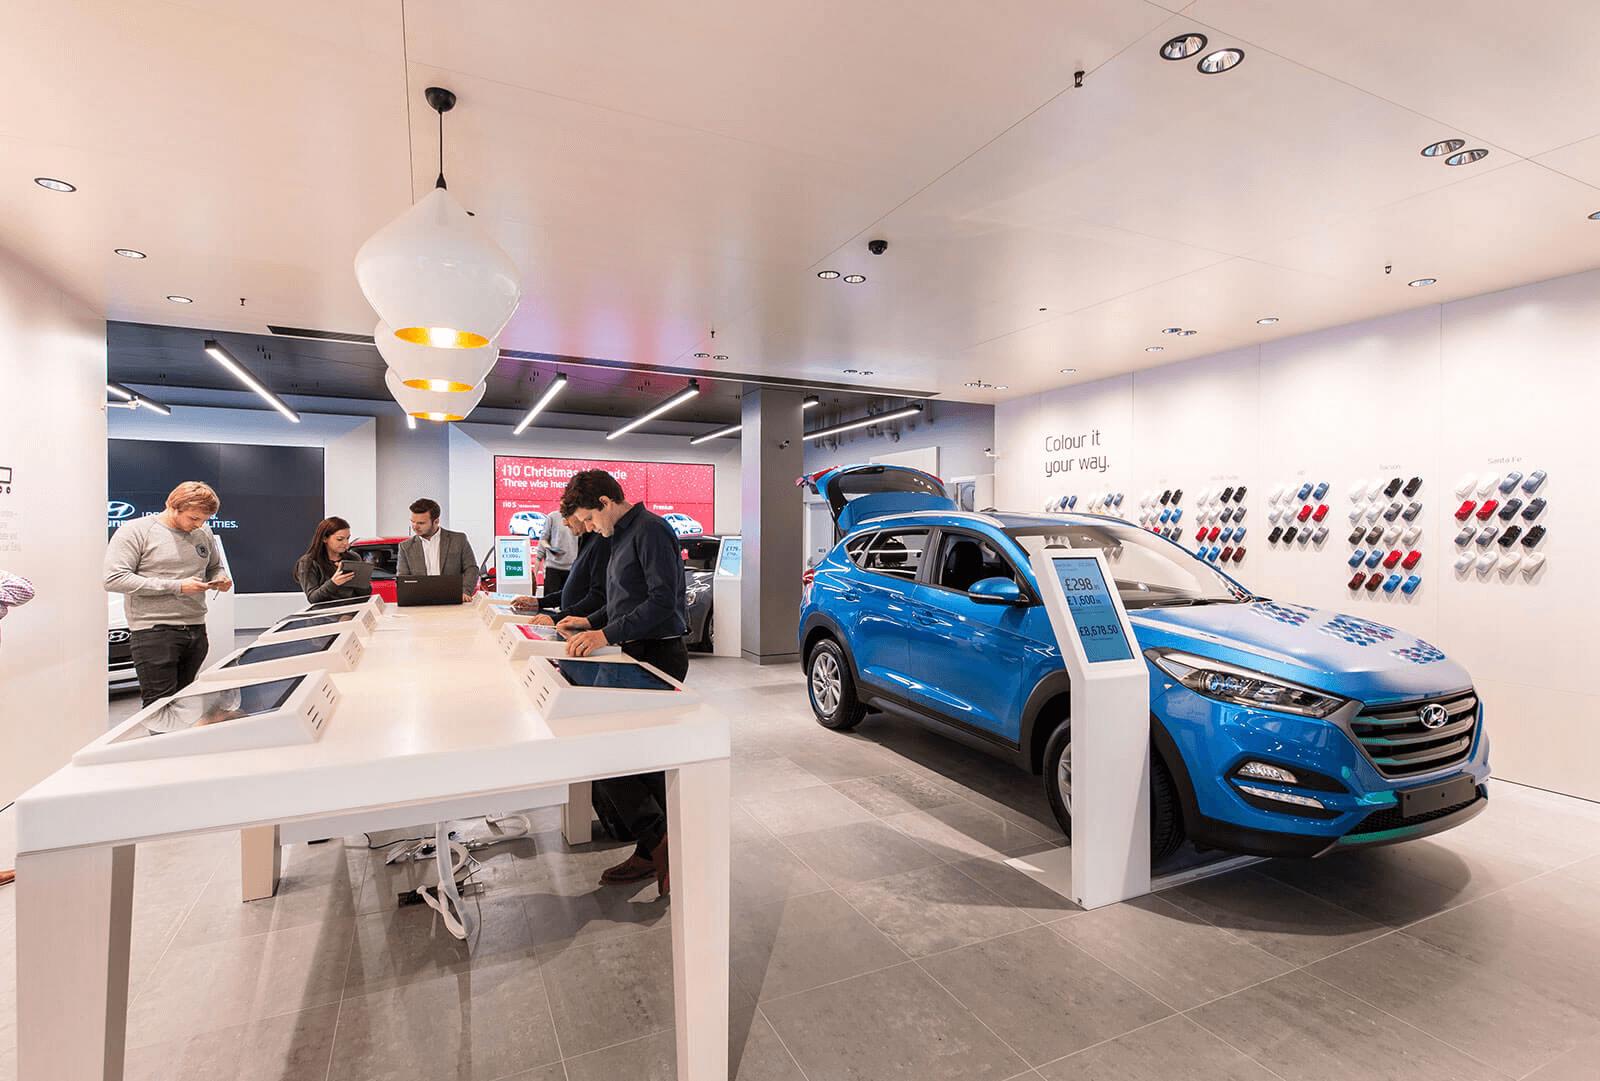 Magasin propre de vente directe Hyundai dans un mall